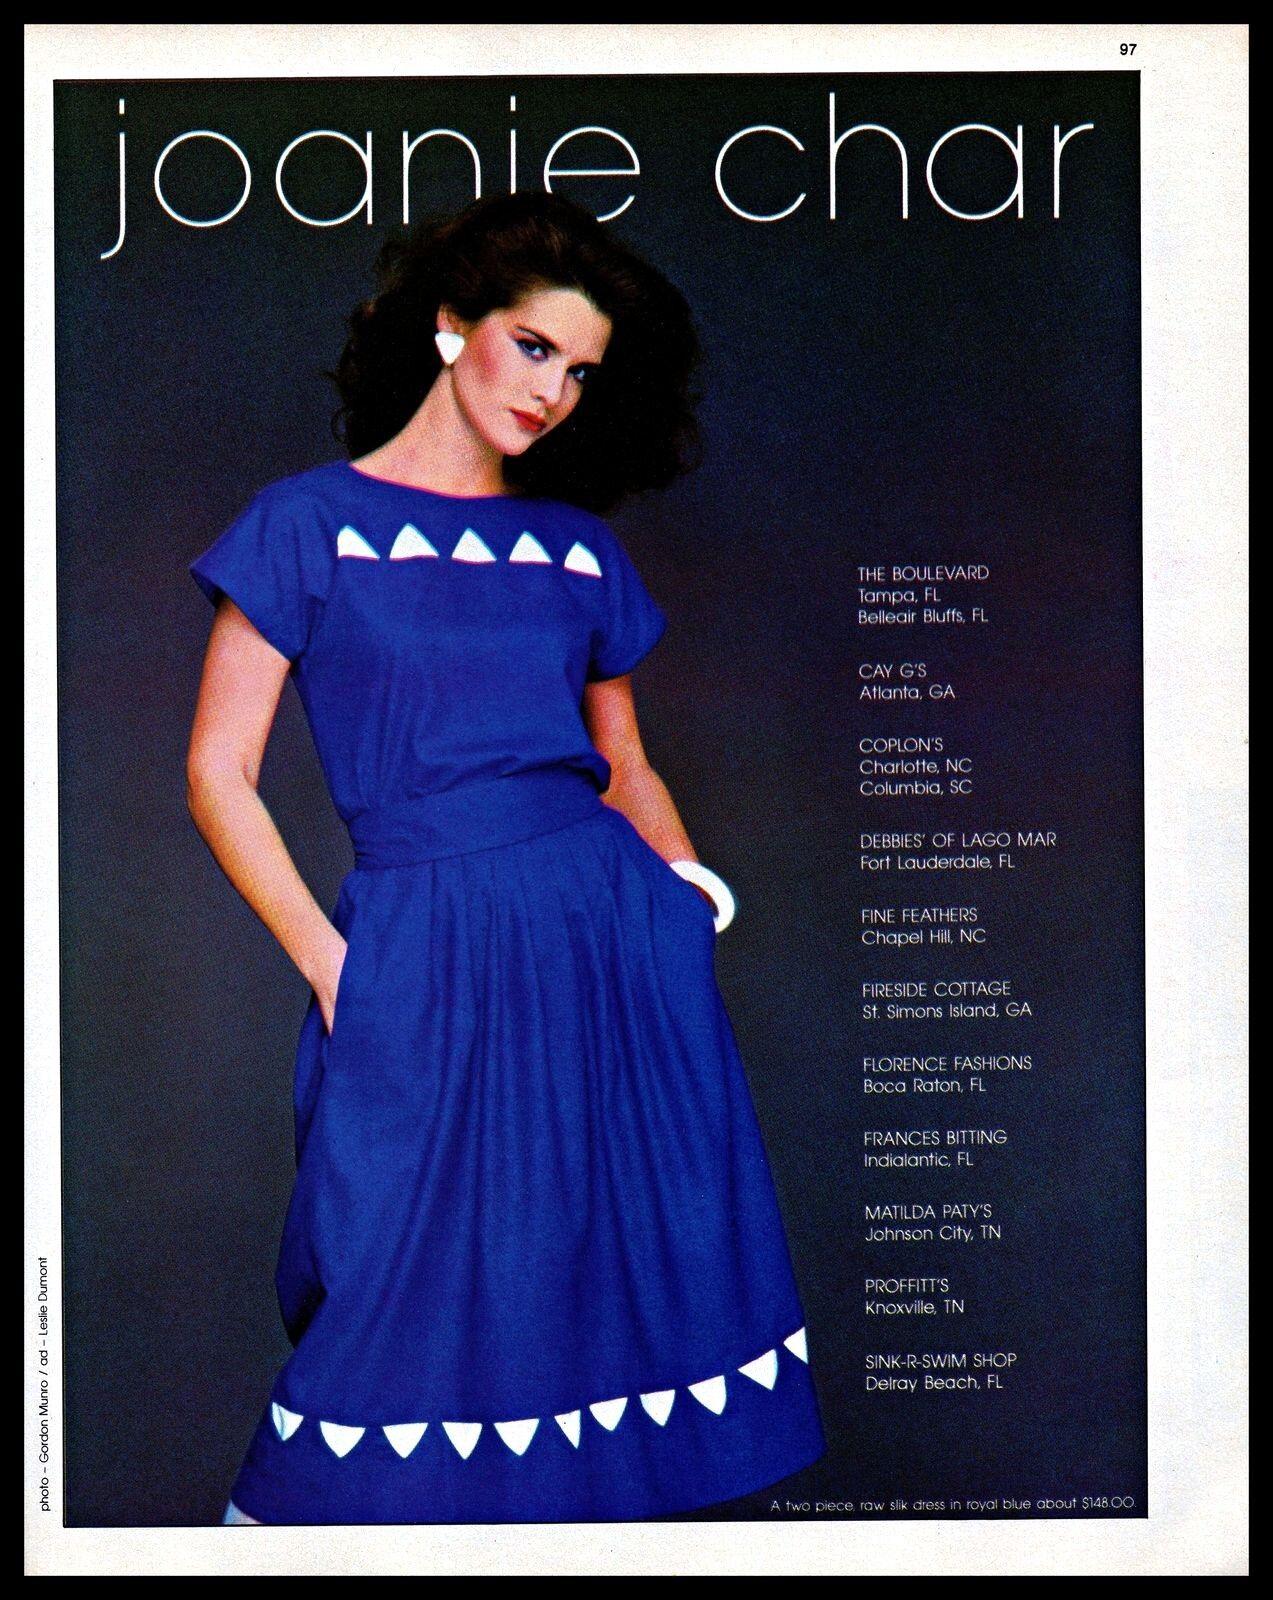 1983 Joanie Char Designer Clothing Blue Dress Fashion Vintage 1980s Print Ad